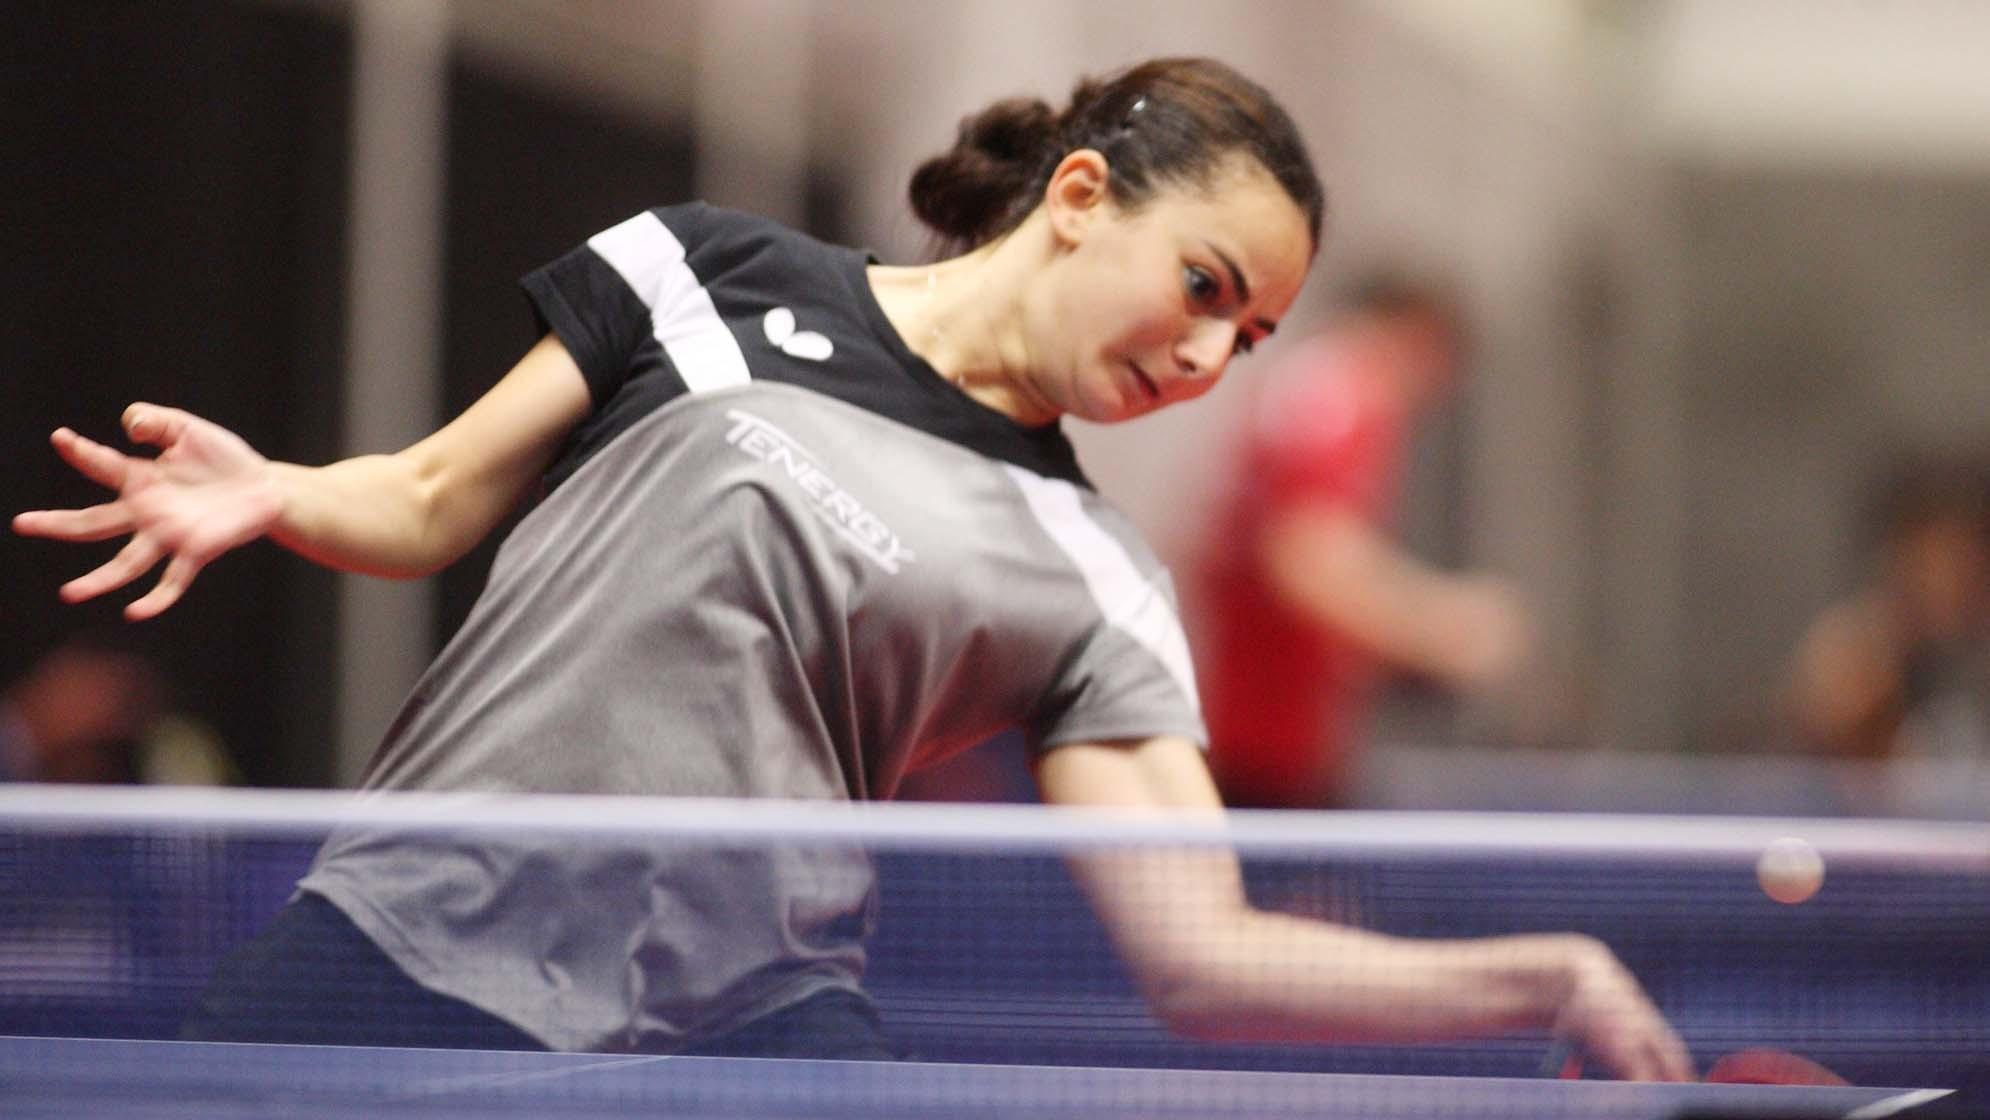 Egypt's Dina Meshref is the defending women's singles champion ©Ireneusz Kanabrodzki/ITTF